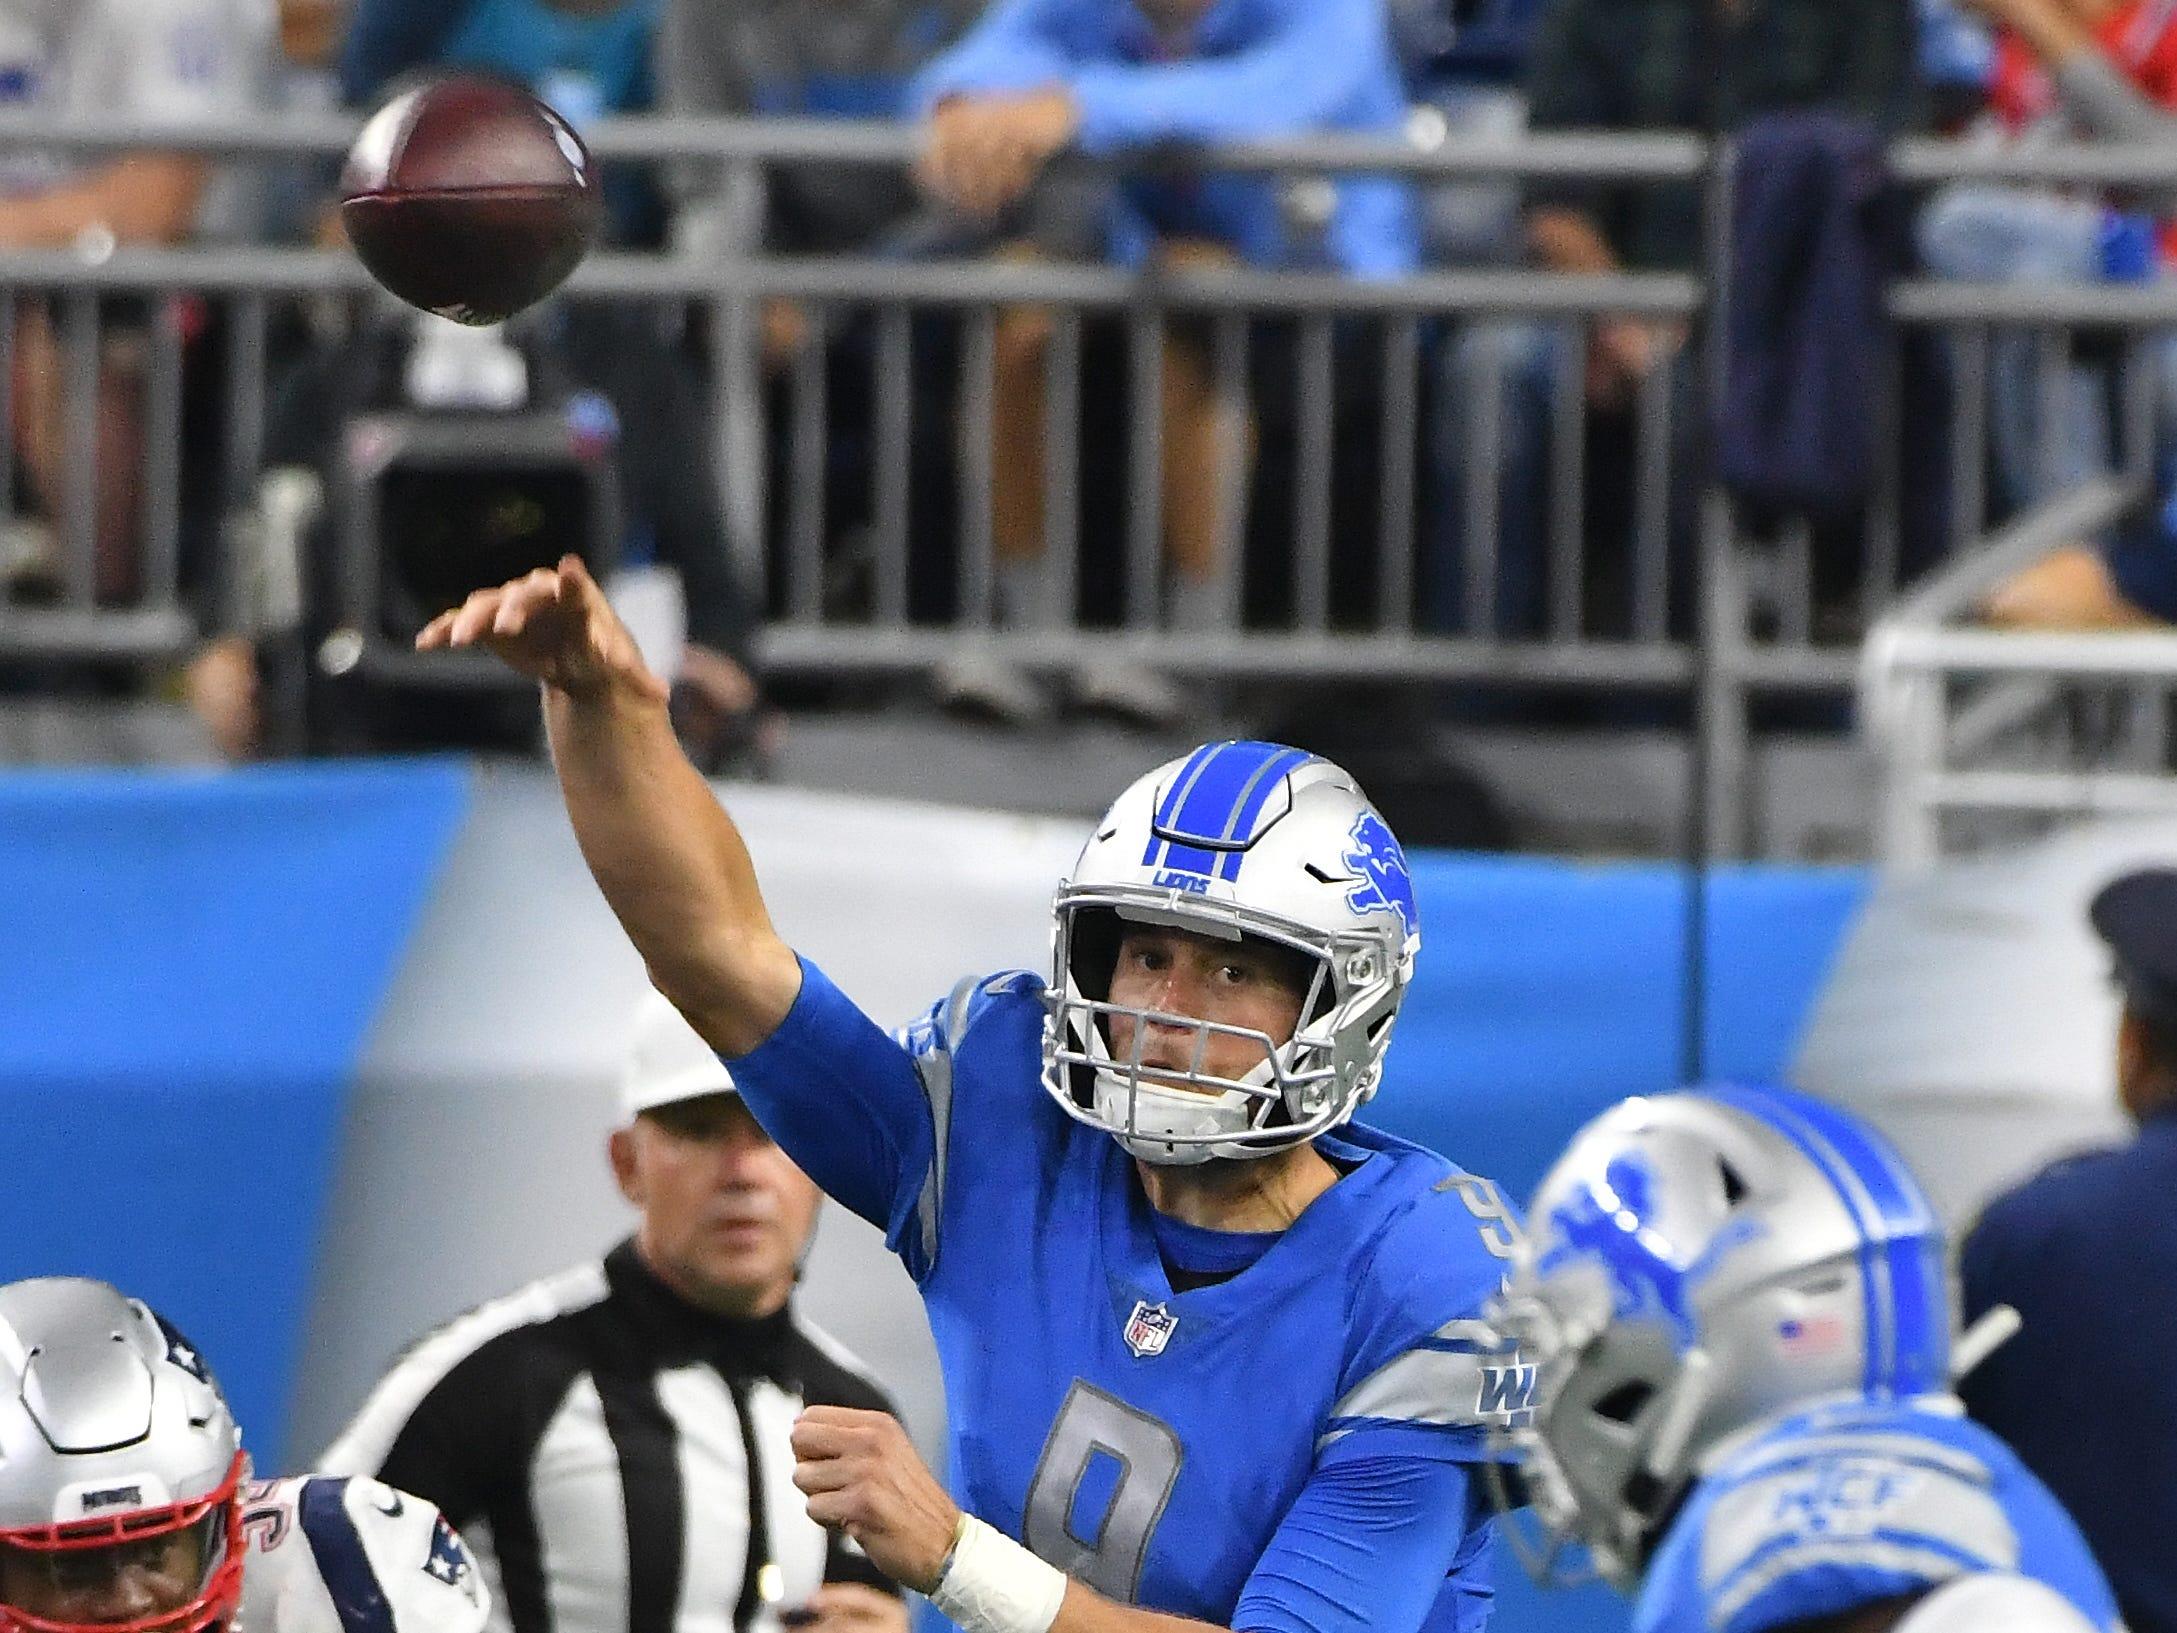 Lions quarterback Matthew Stafford throws in the 4th quarter.